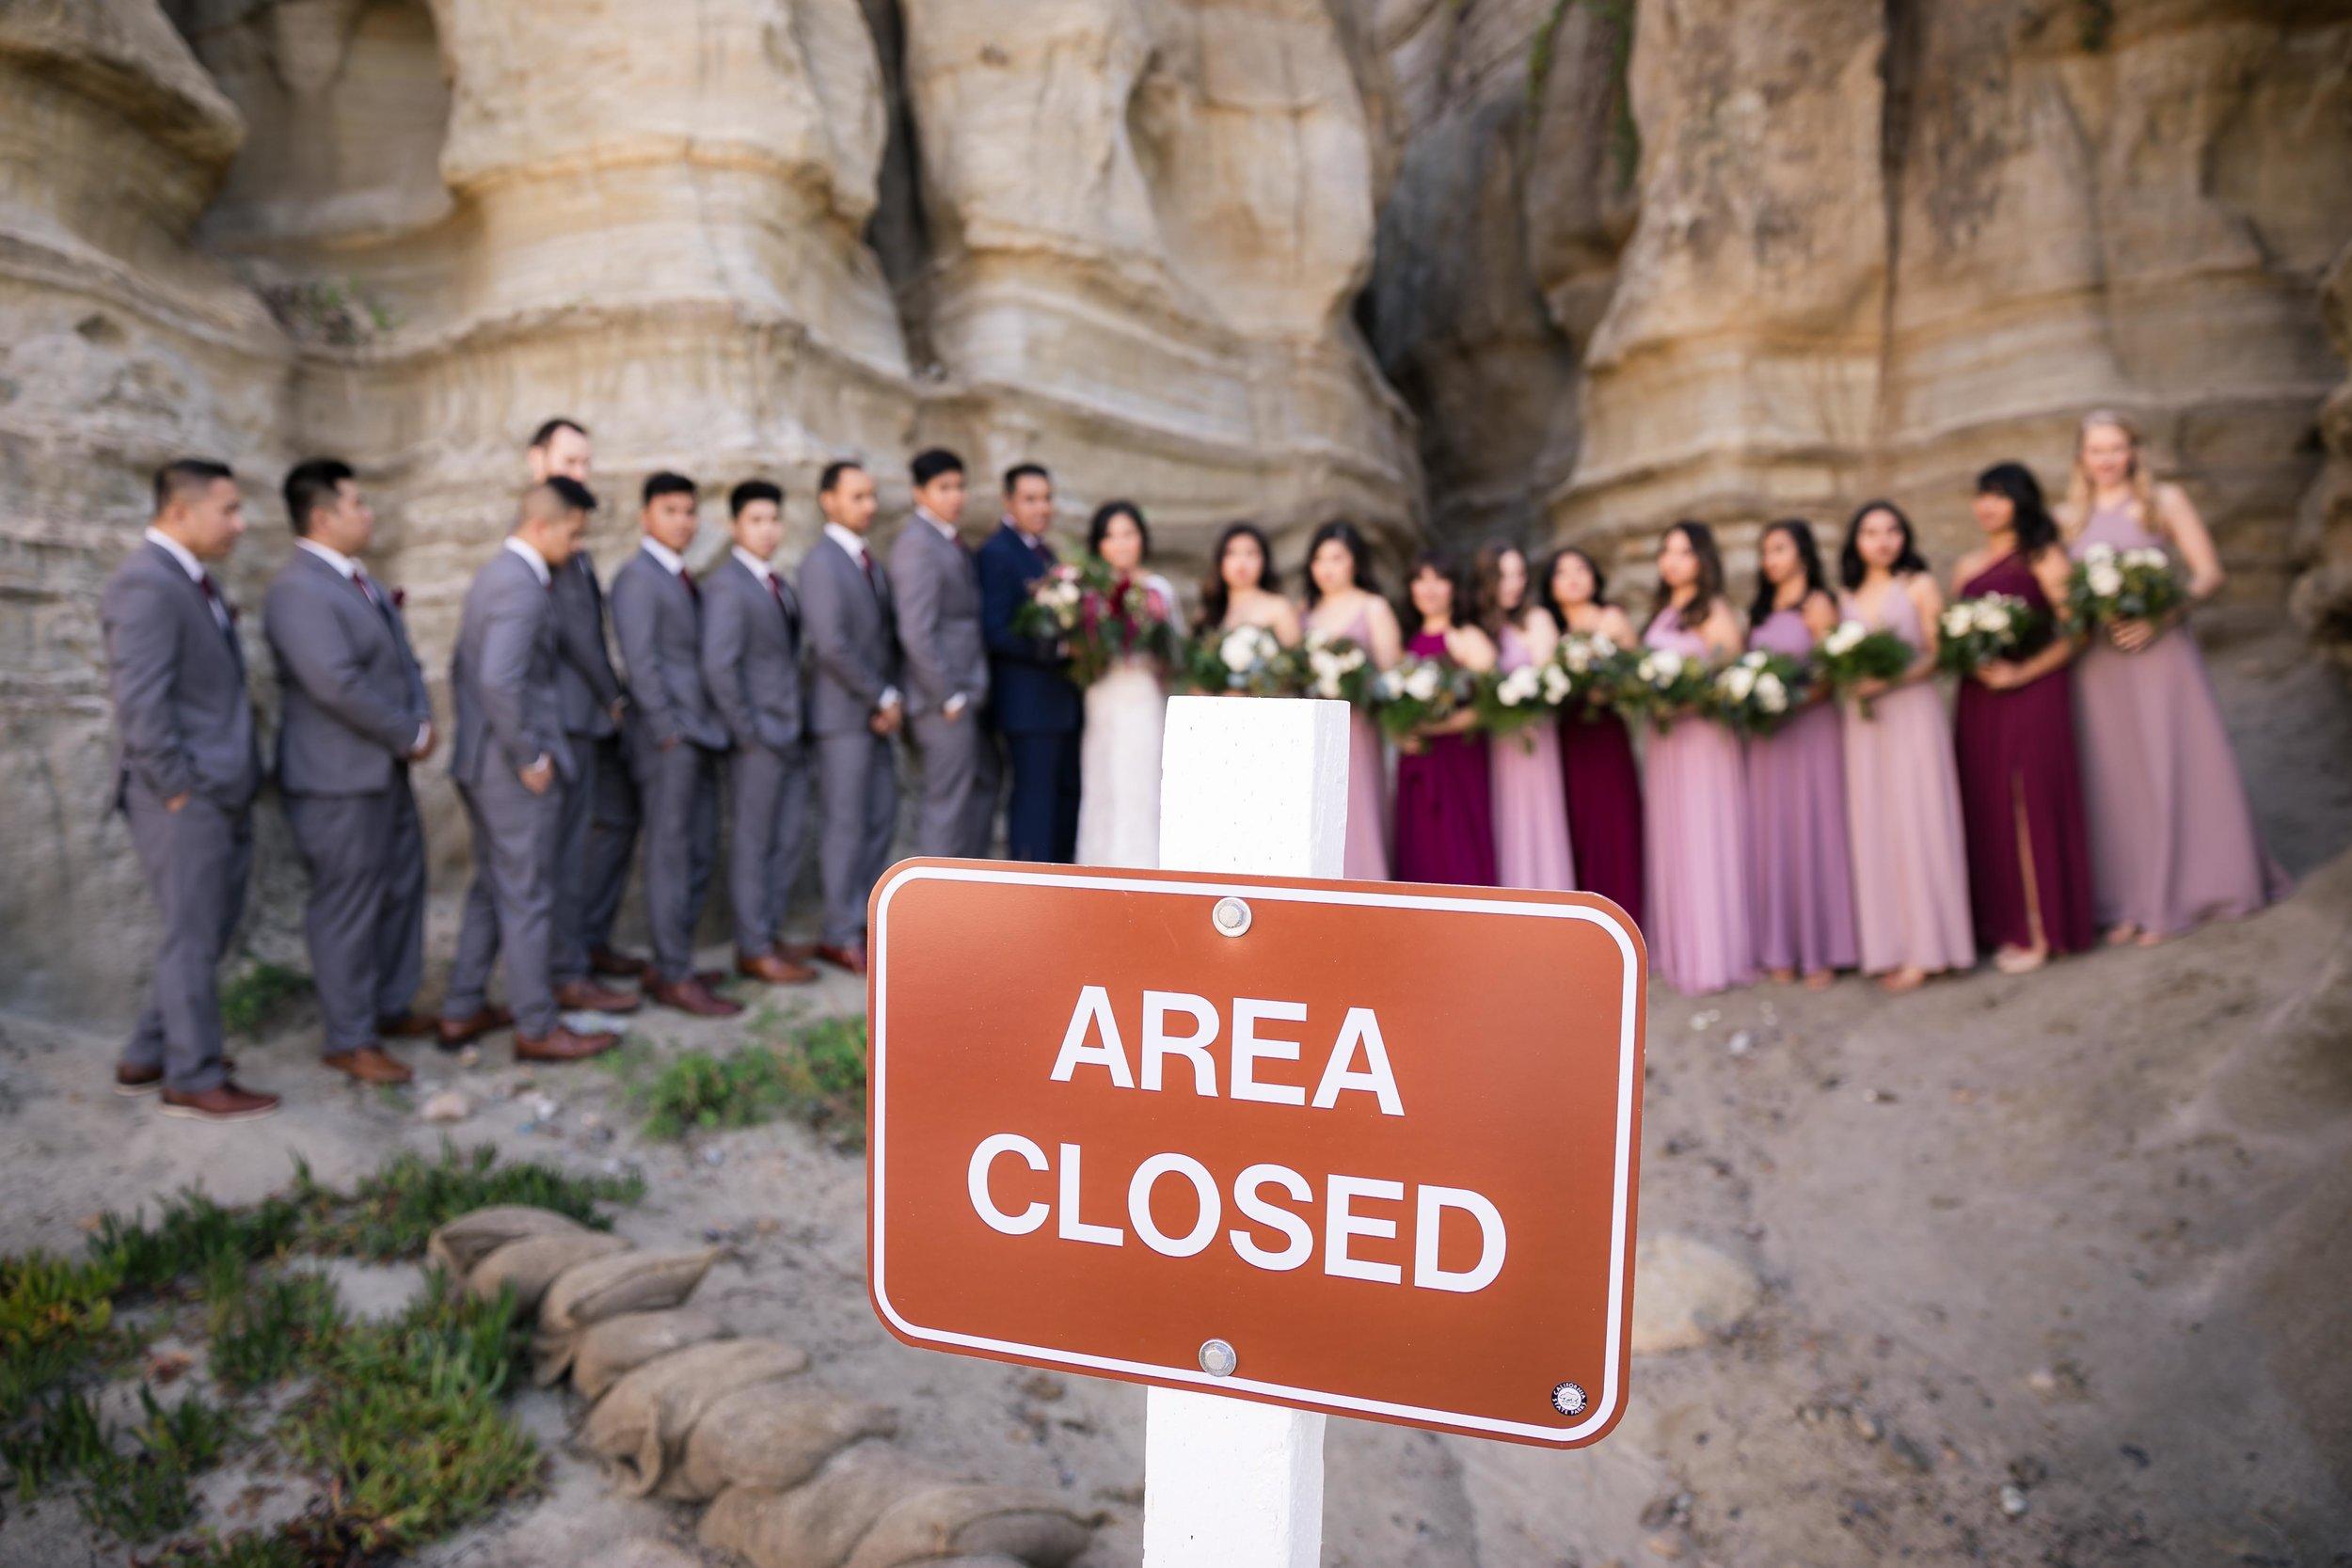 southern_california_wedding_joshuachun_photography-5.JPG